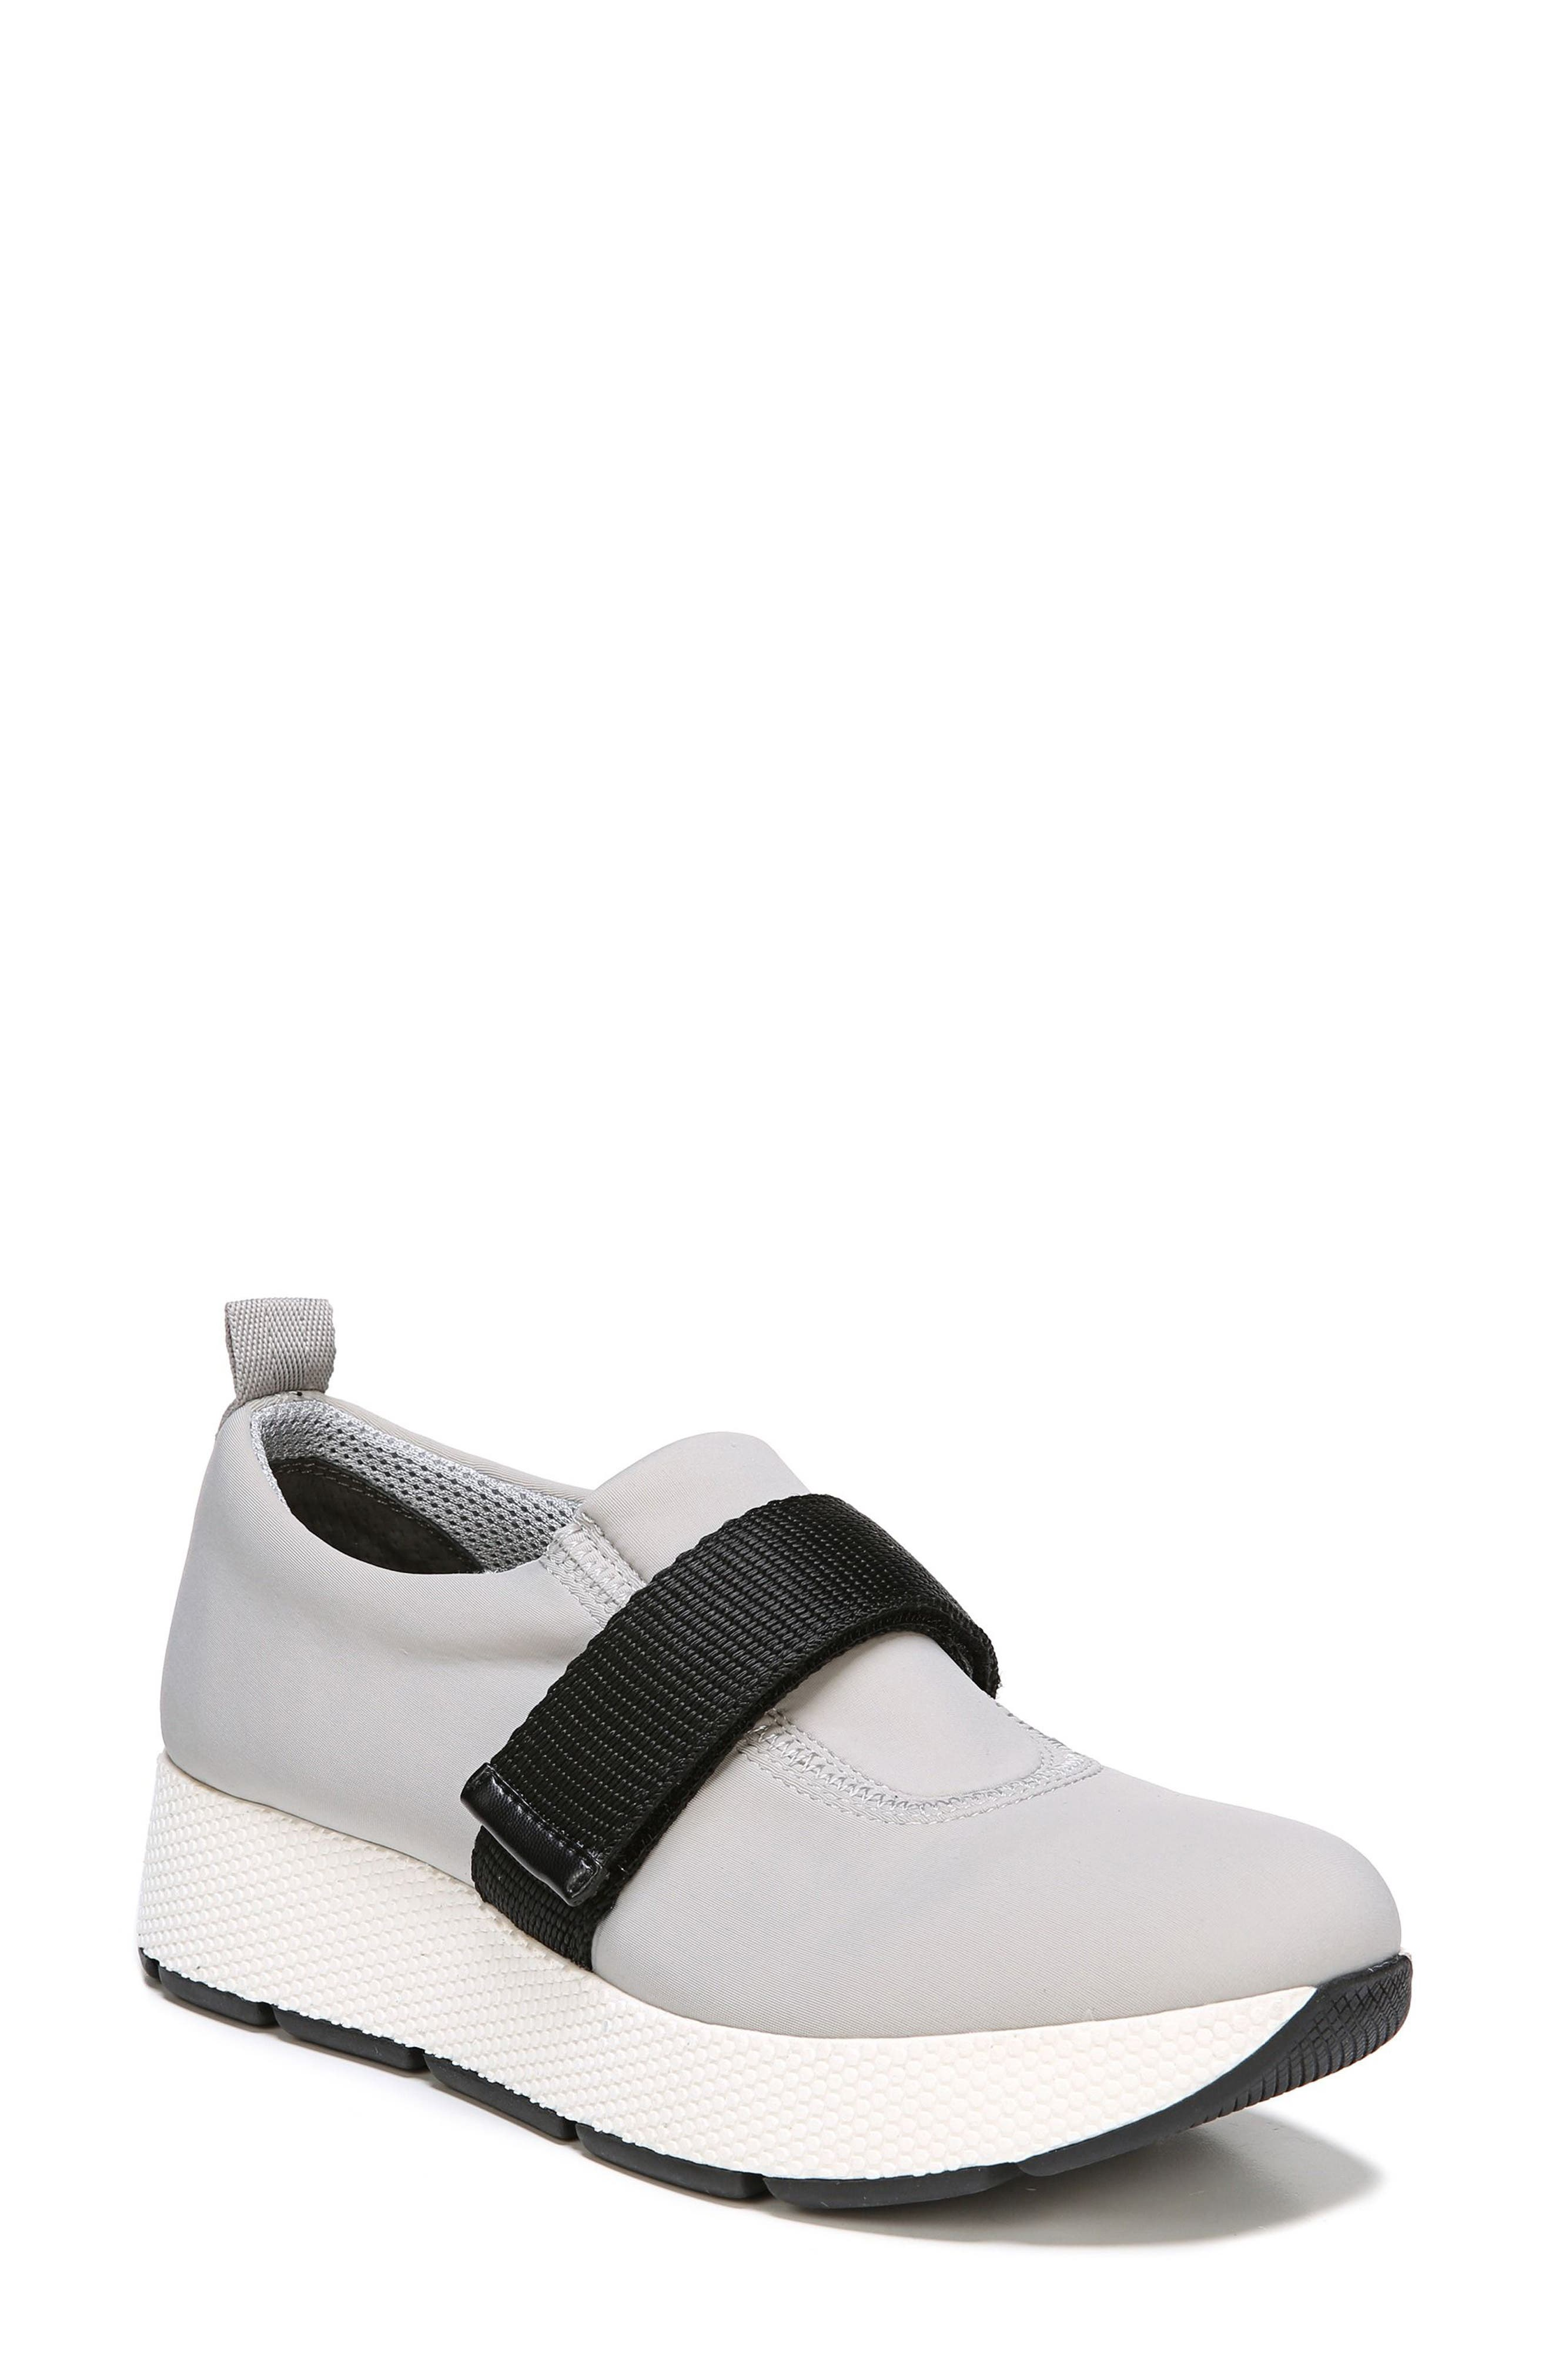 Main Image - SARTO by Franco Sarto Odella Slip-On Sneaker (Women)